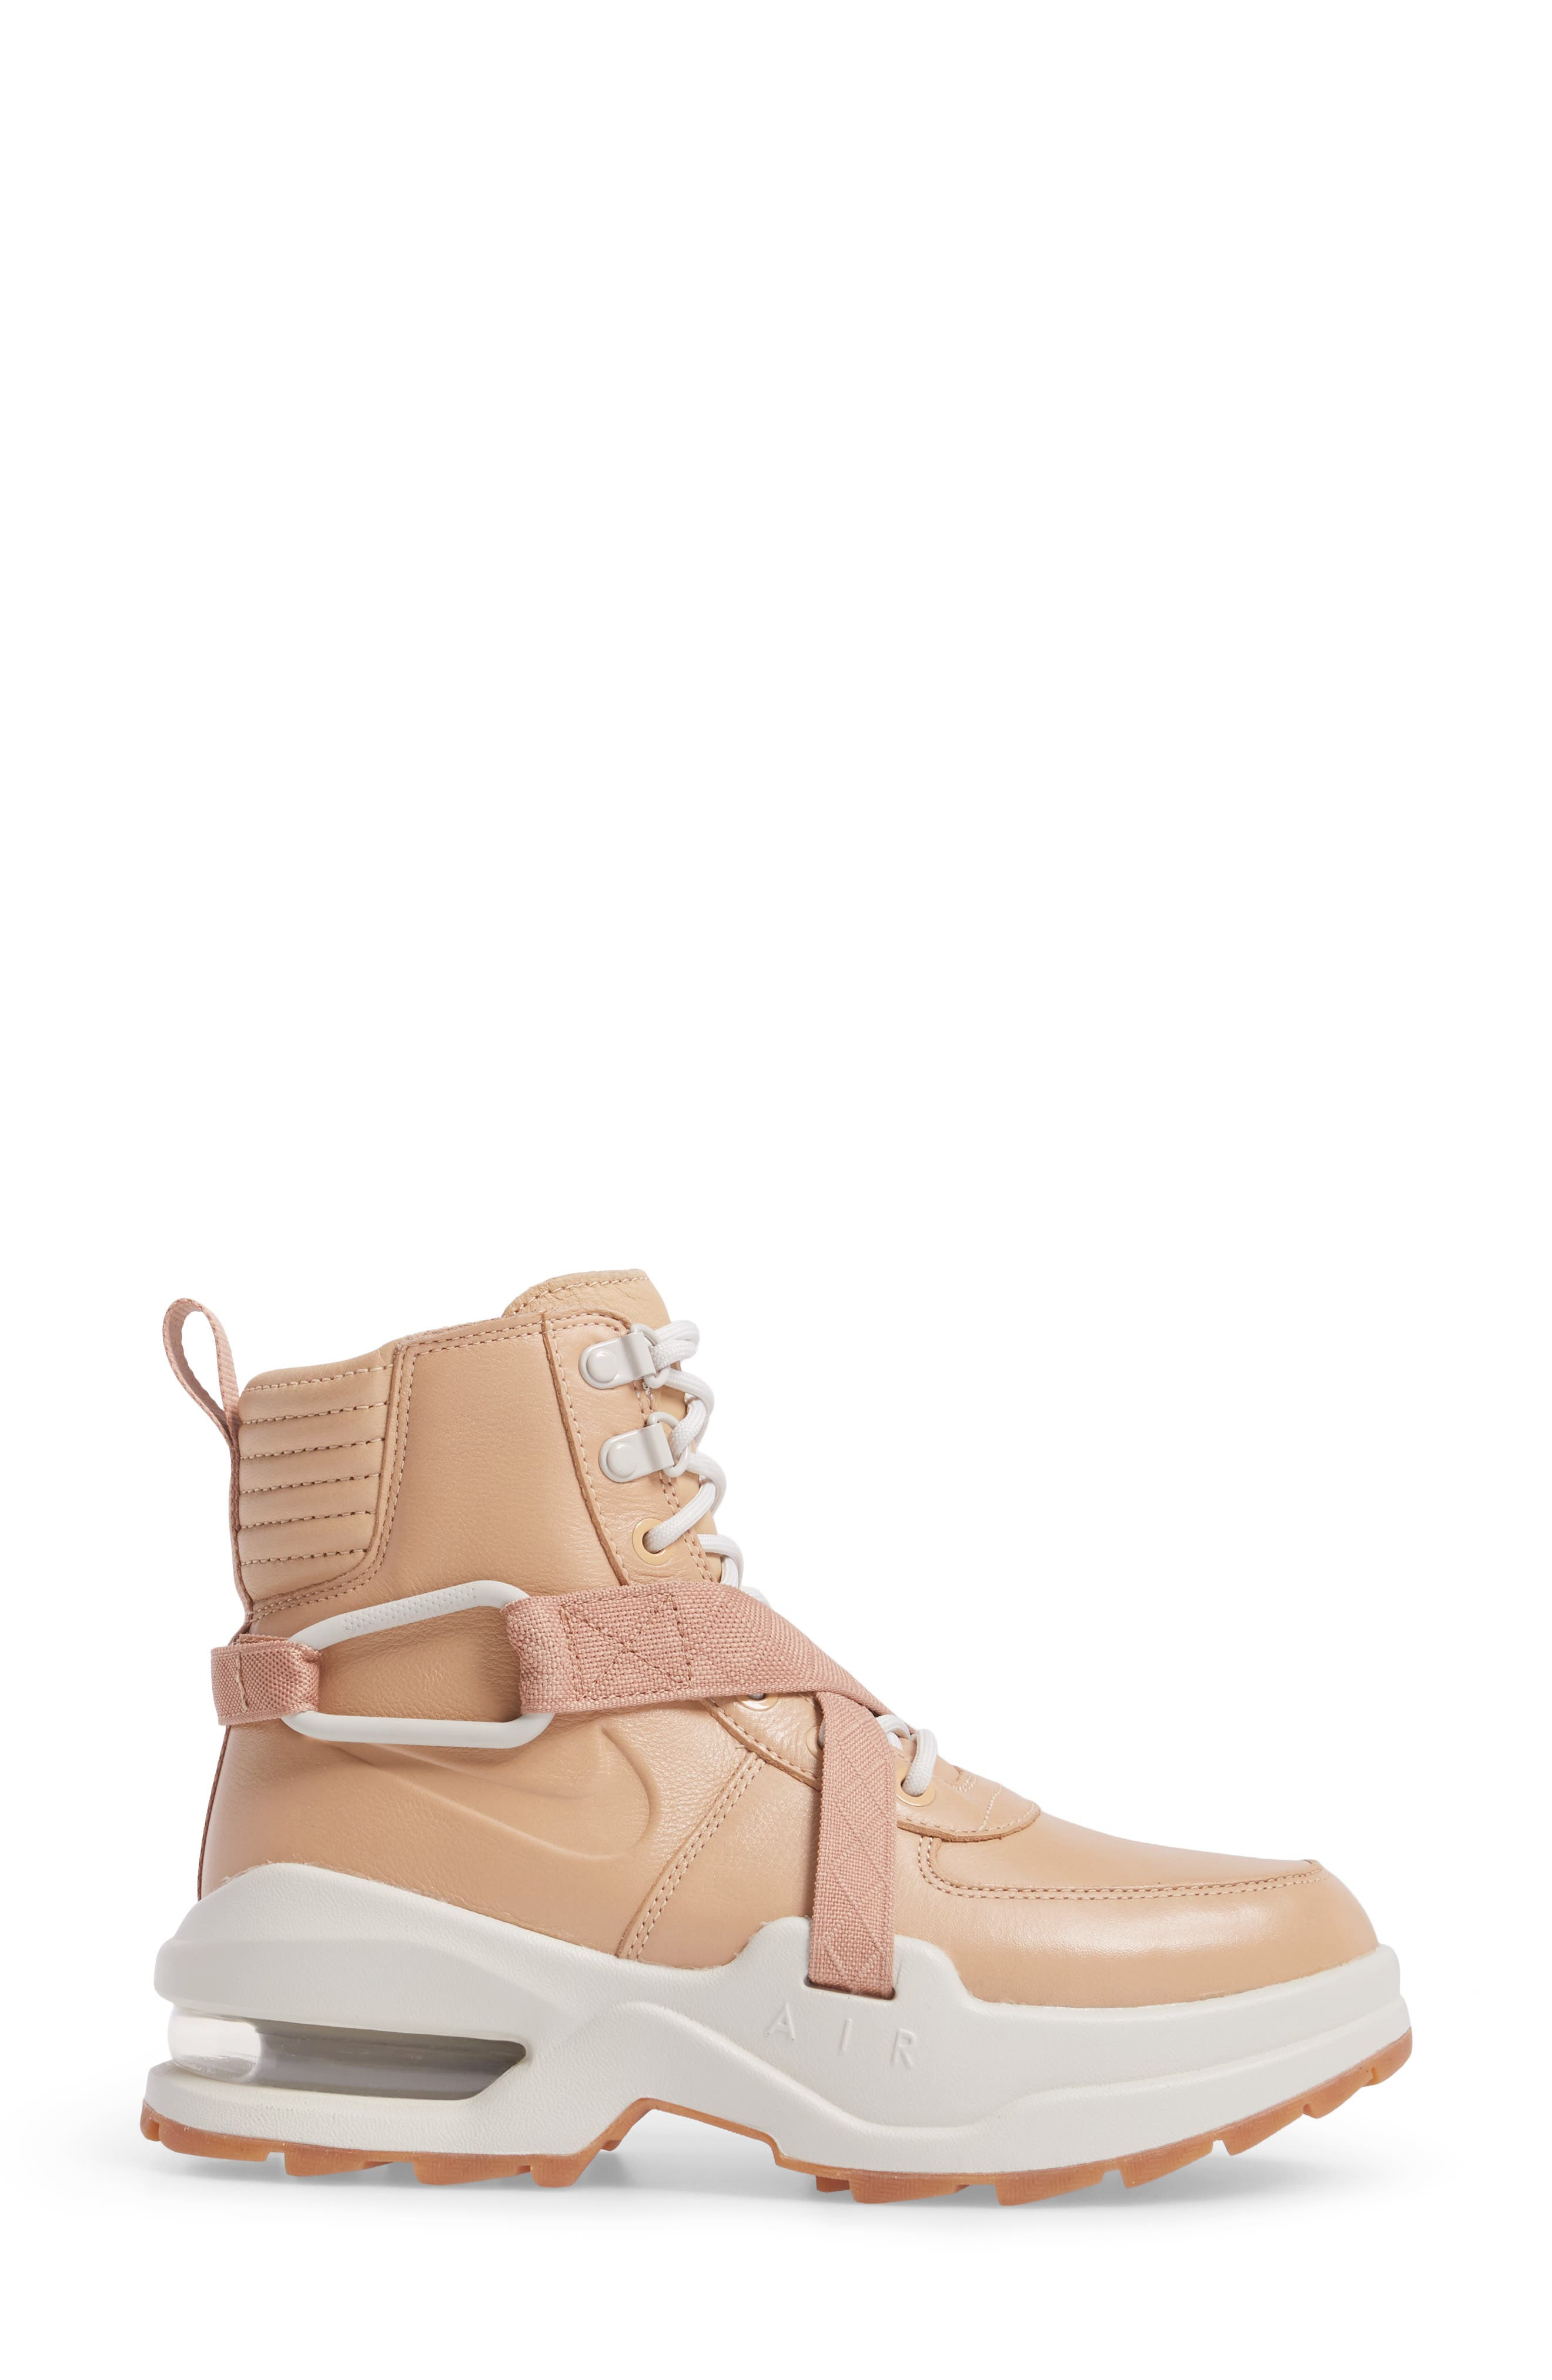 Air Max Goadome Sneaker Boot,                             Alternate thumbnail 3, color,                             Tan/ Tan/ Light Bone/ Clay